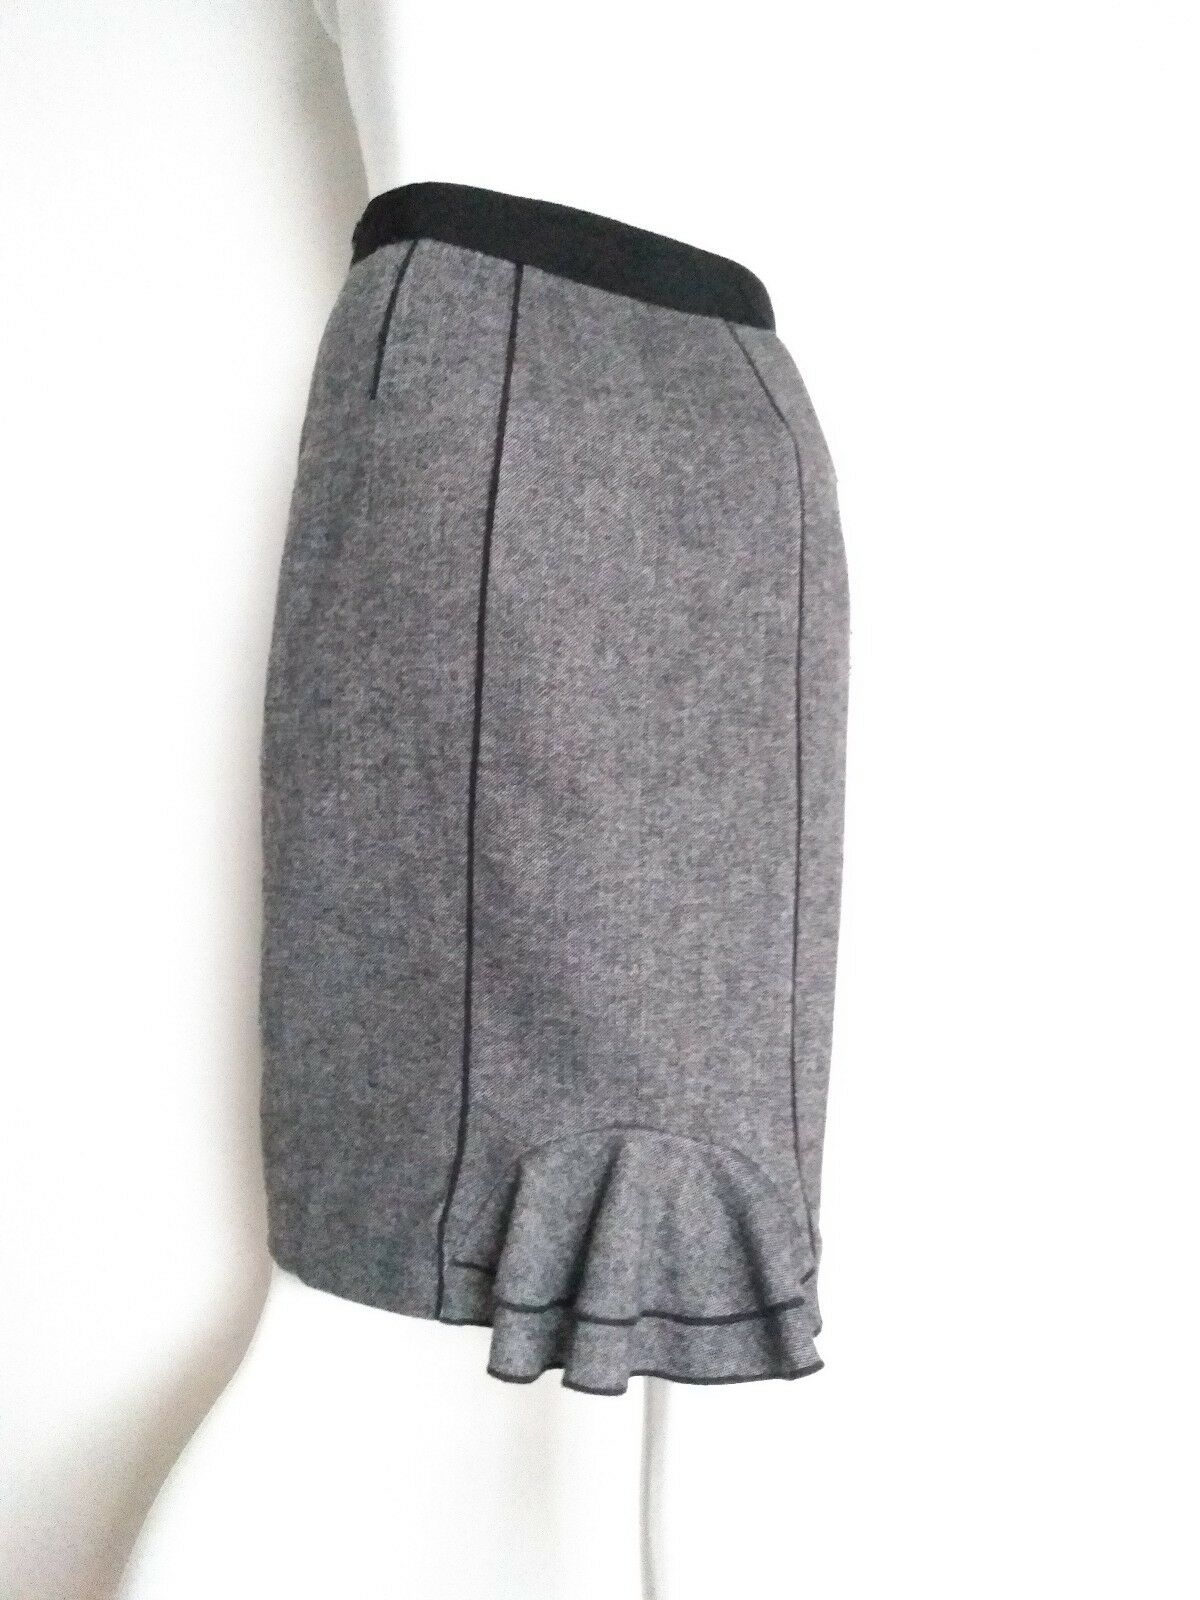 COAST wool tweed midi skirt size 8 knee length fishtail grey lined